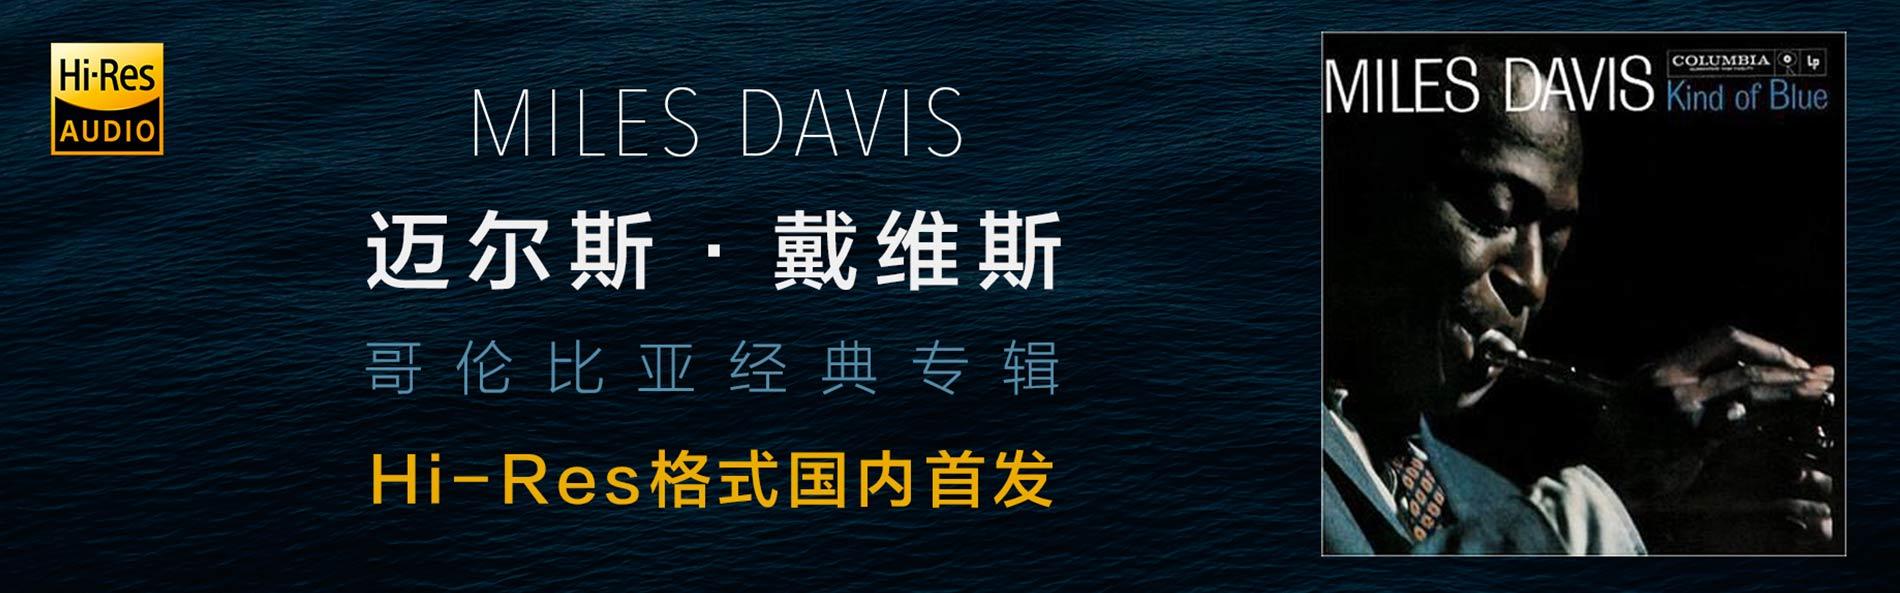 M.DAVIS-web